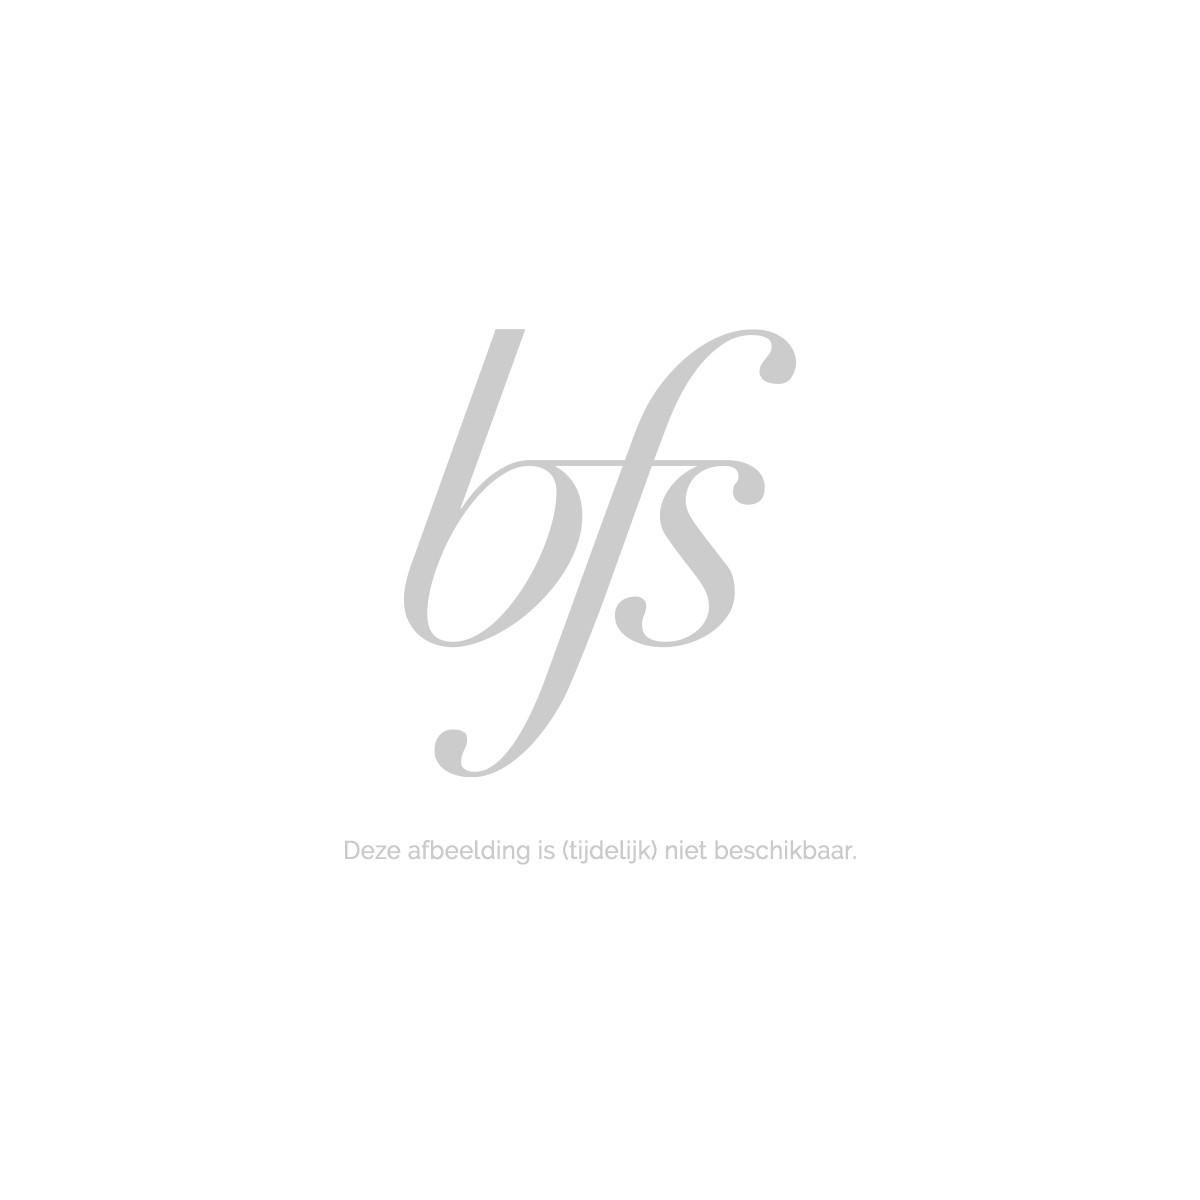 Michael Kors Wonderlust Sensual Essence Eau De Parfum 30 ml